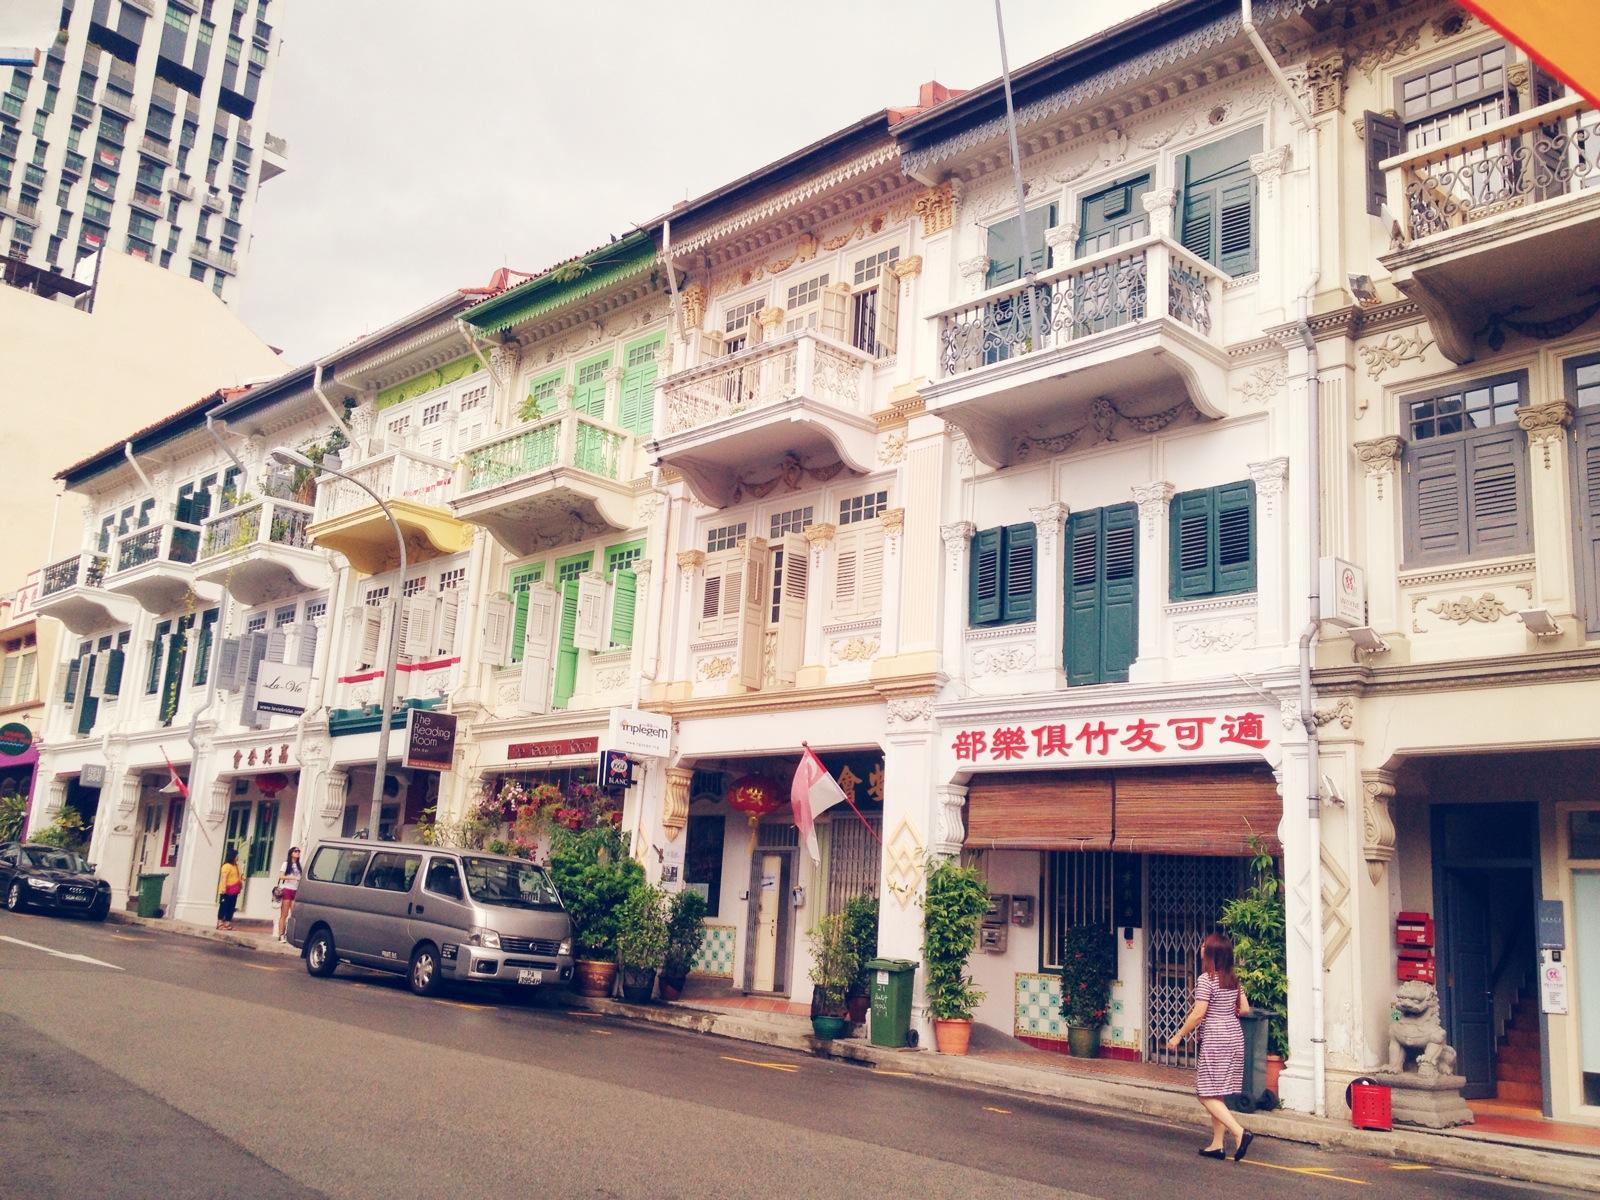 5-Foreign-Kitchens - Singapore | www.8thandlake.com